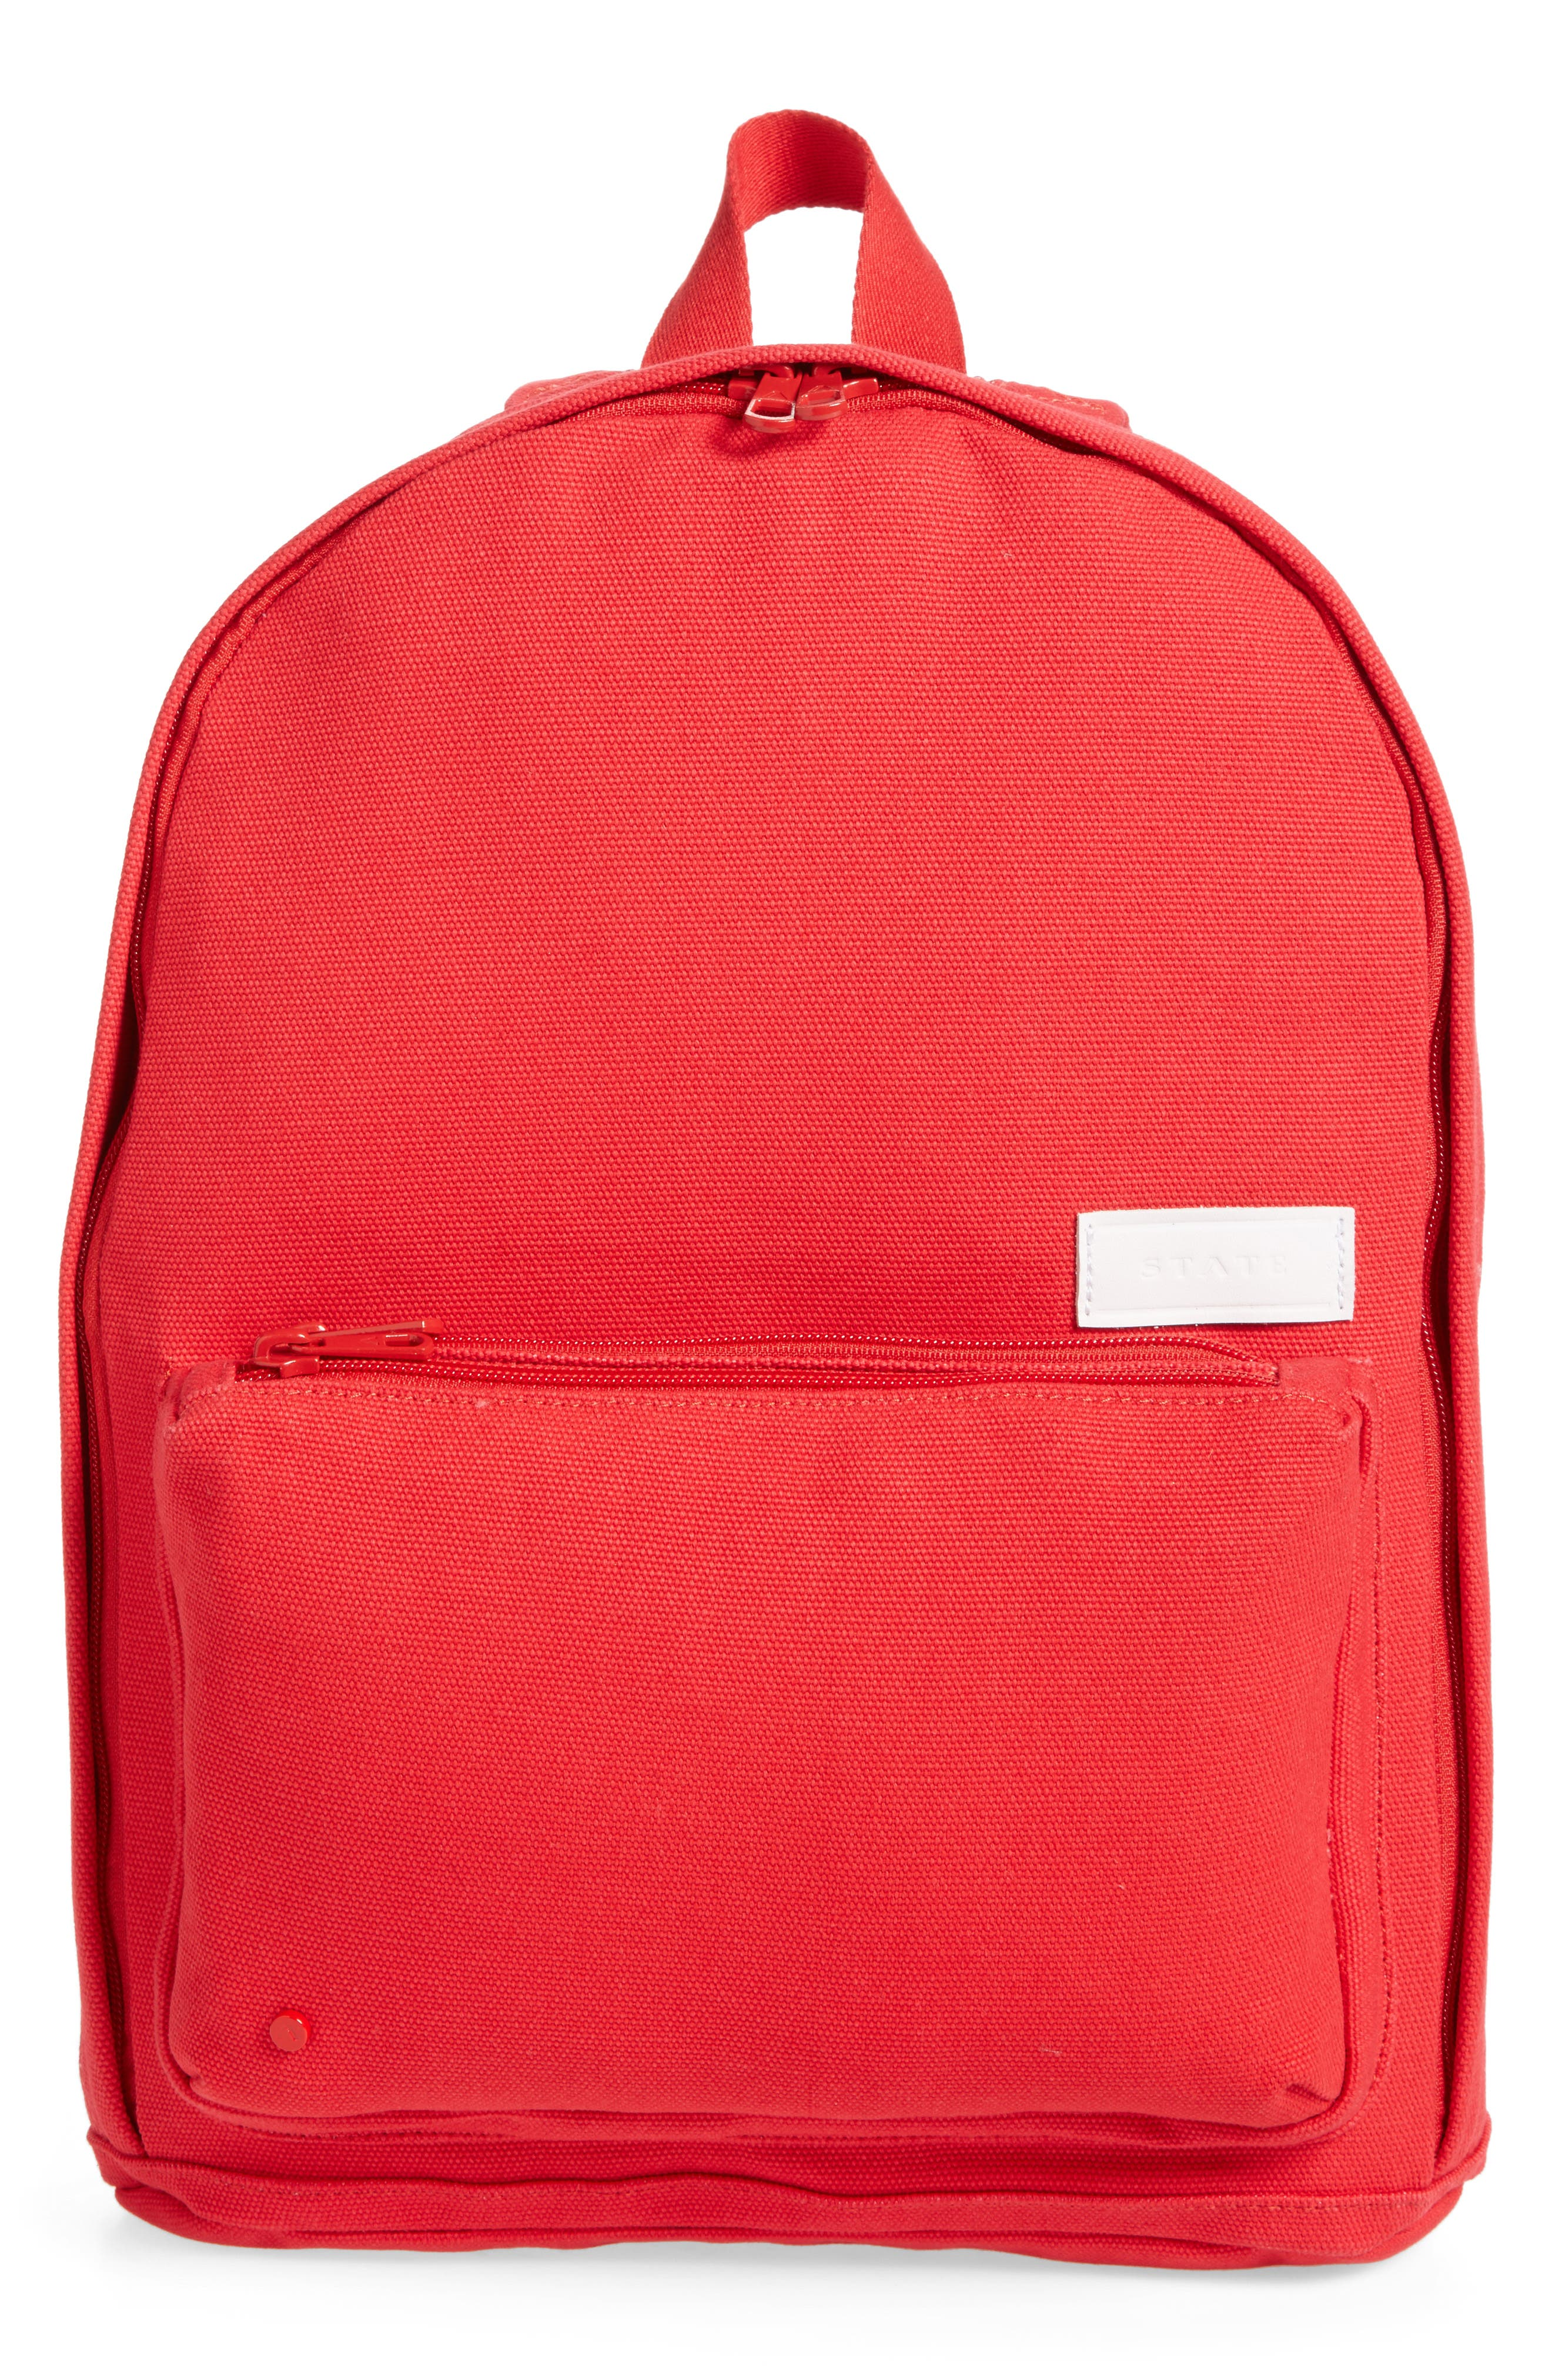 Main Image - STATE Bags Slim Lorimer Water Resistant Canvas Backpack